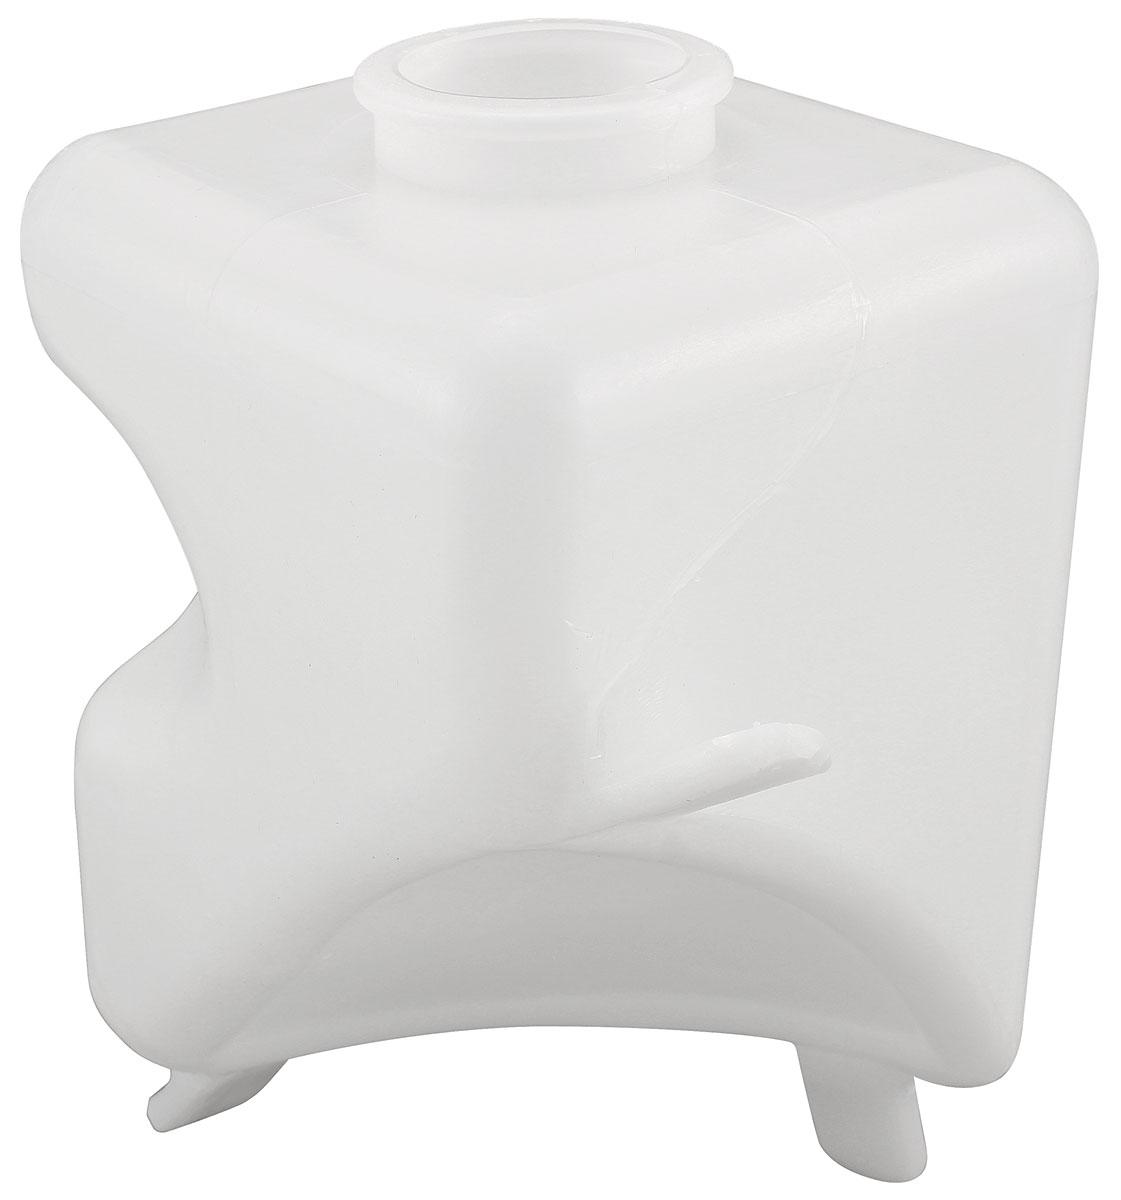 Washer Bottle, 1970-72 Oldsmobile, White